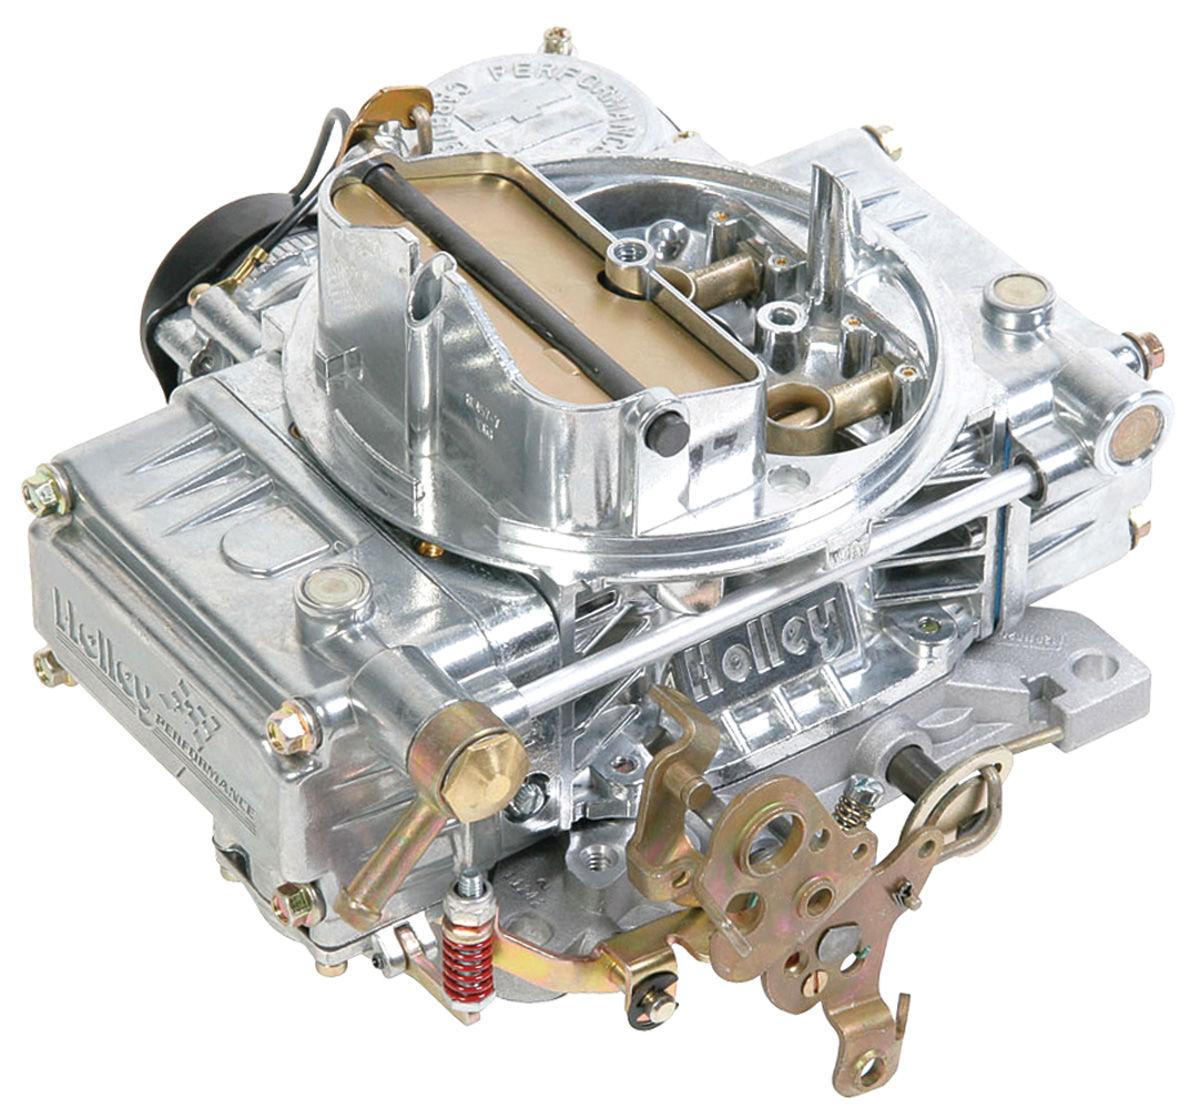 Photo of Carburetor, Vacuum Secondary Electric Choke (600 CFM)